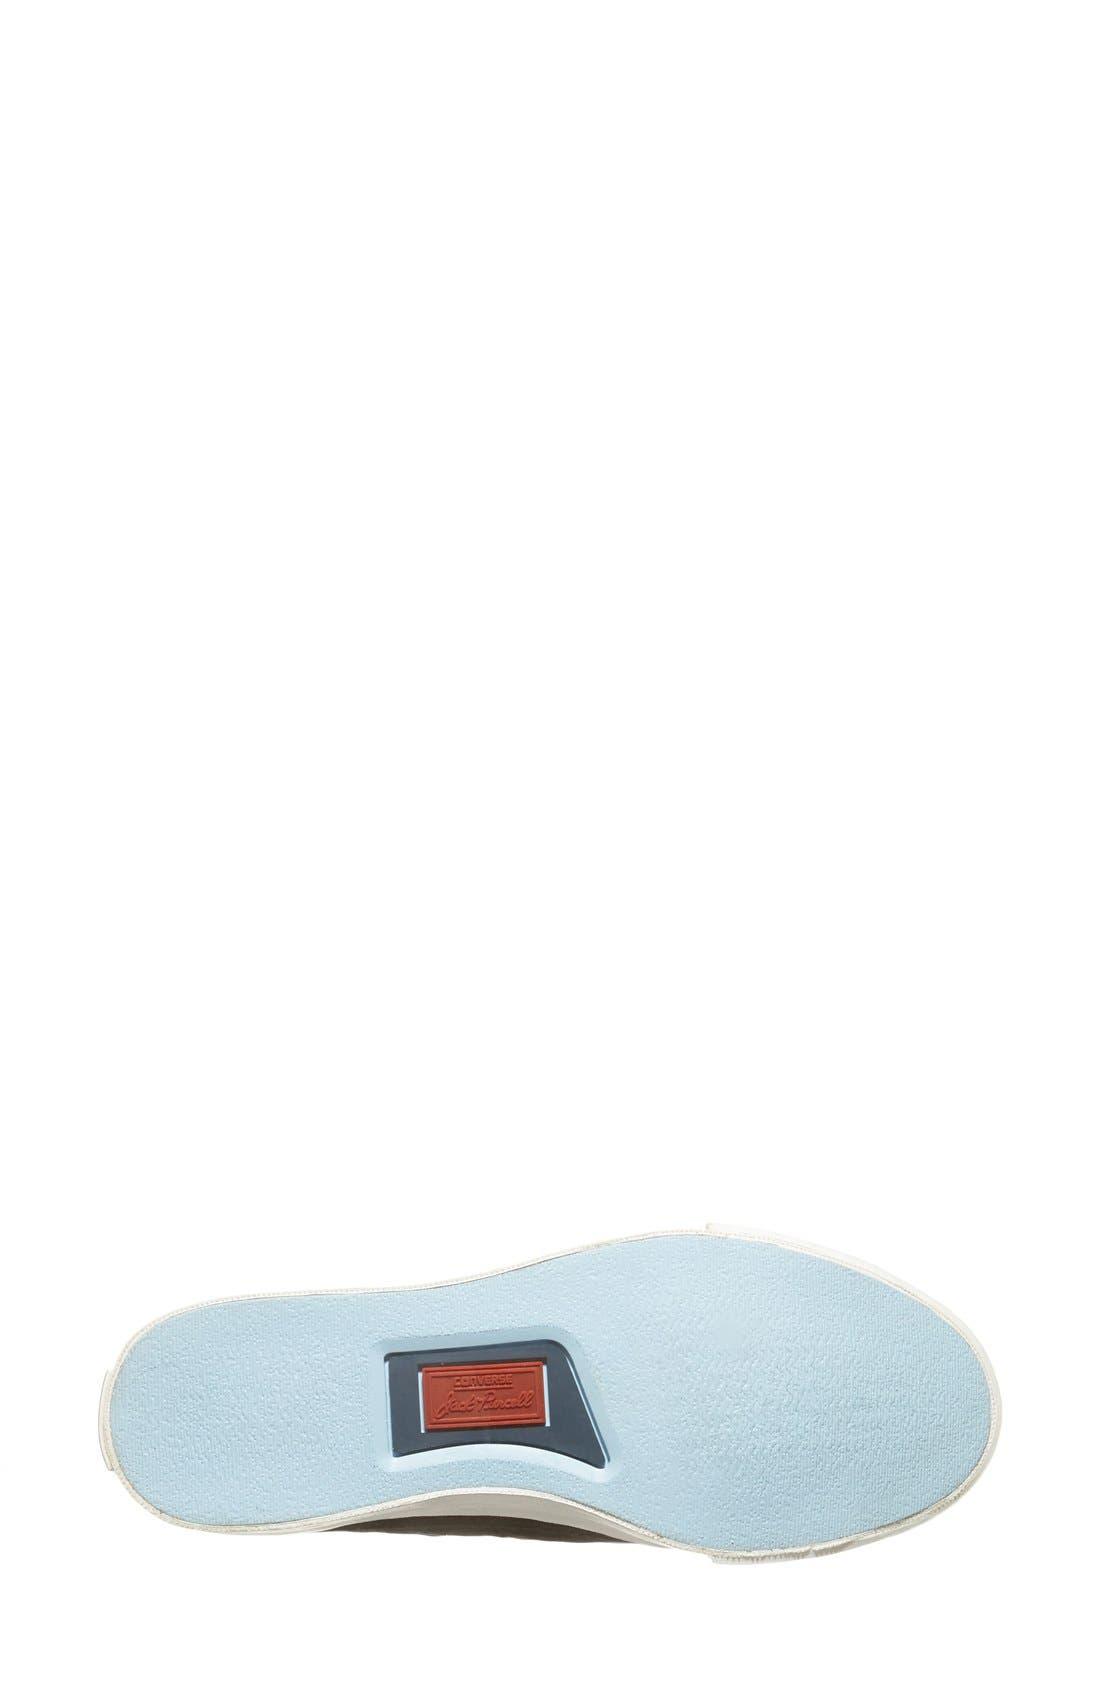 'Jack Purcell' Garment Dye Low Top Sneaker,                             Alternate thumbnail 5, color,